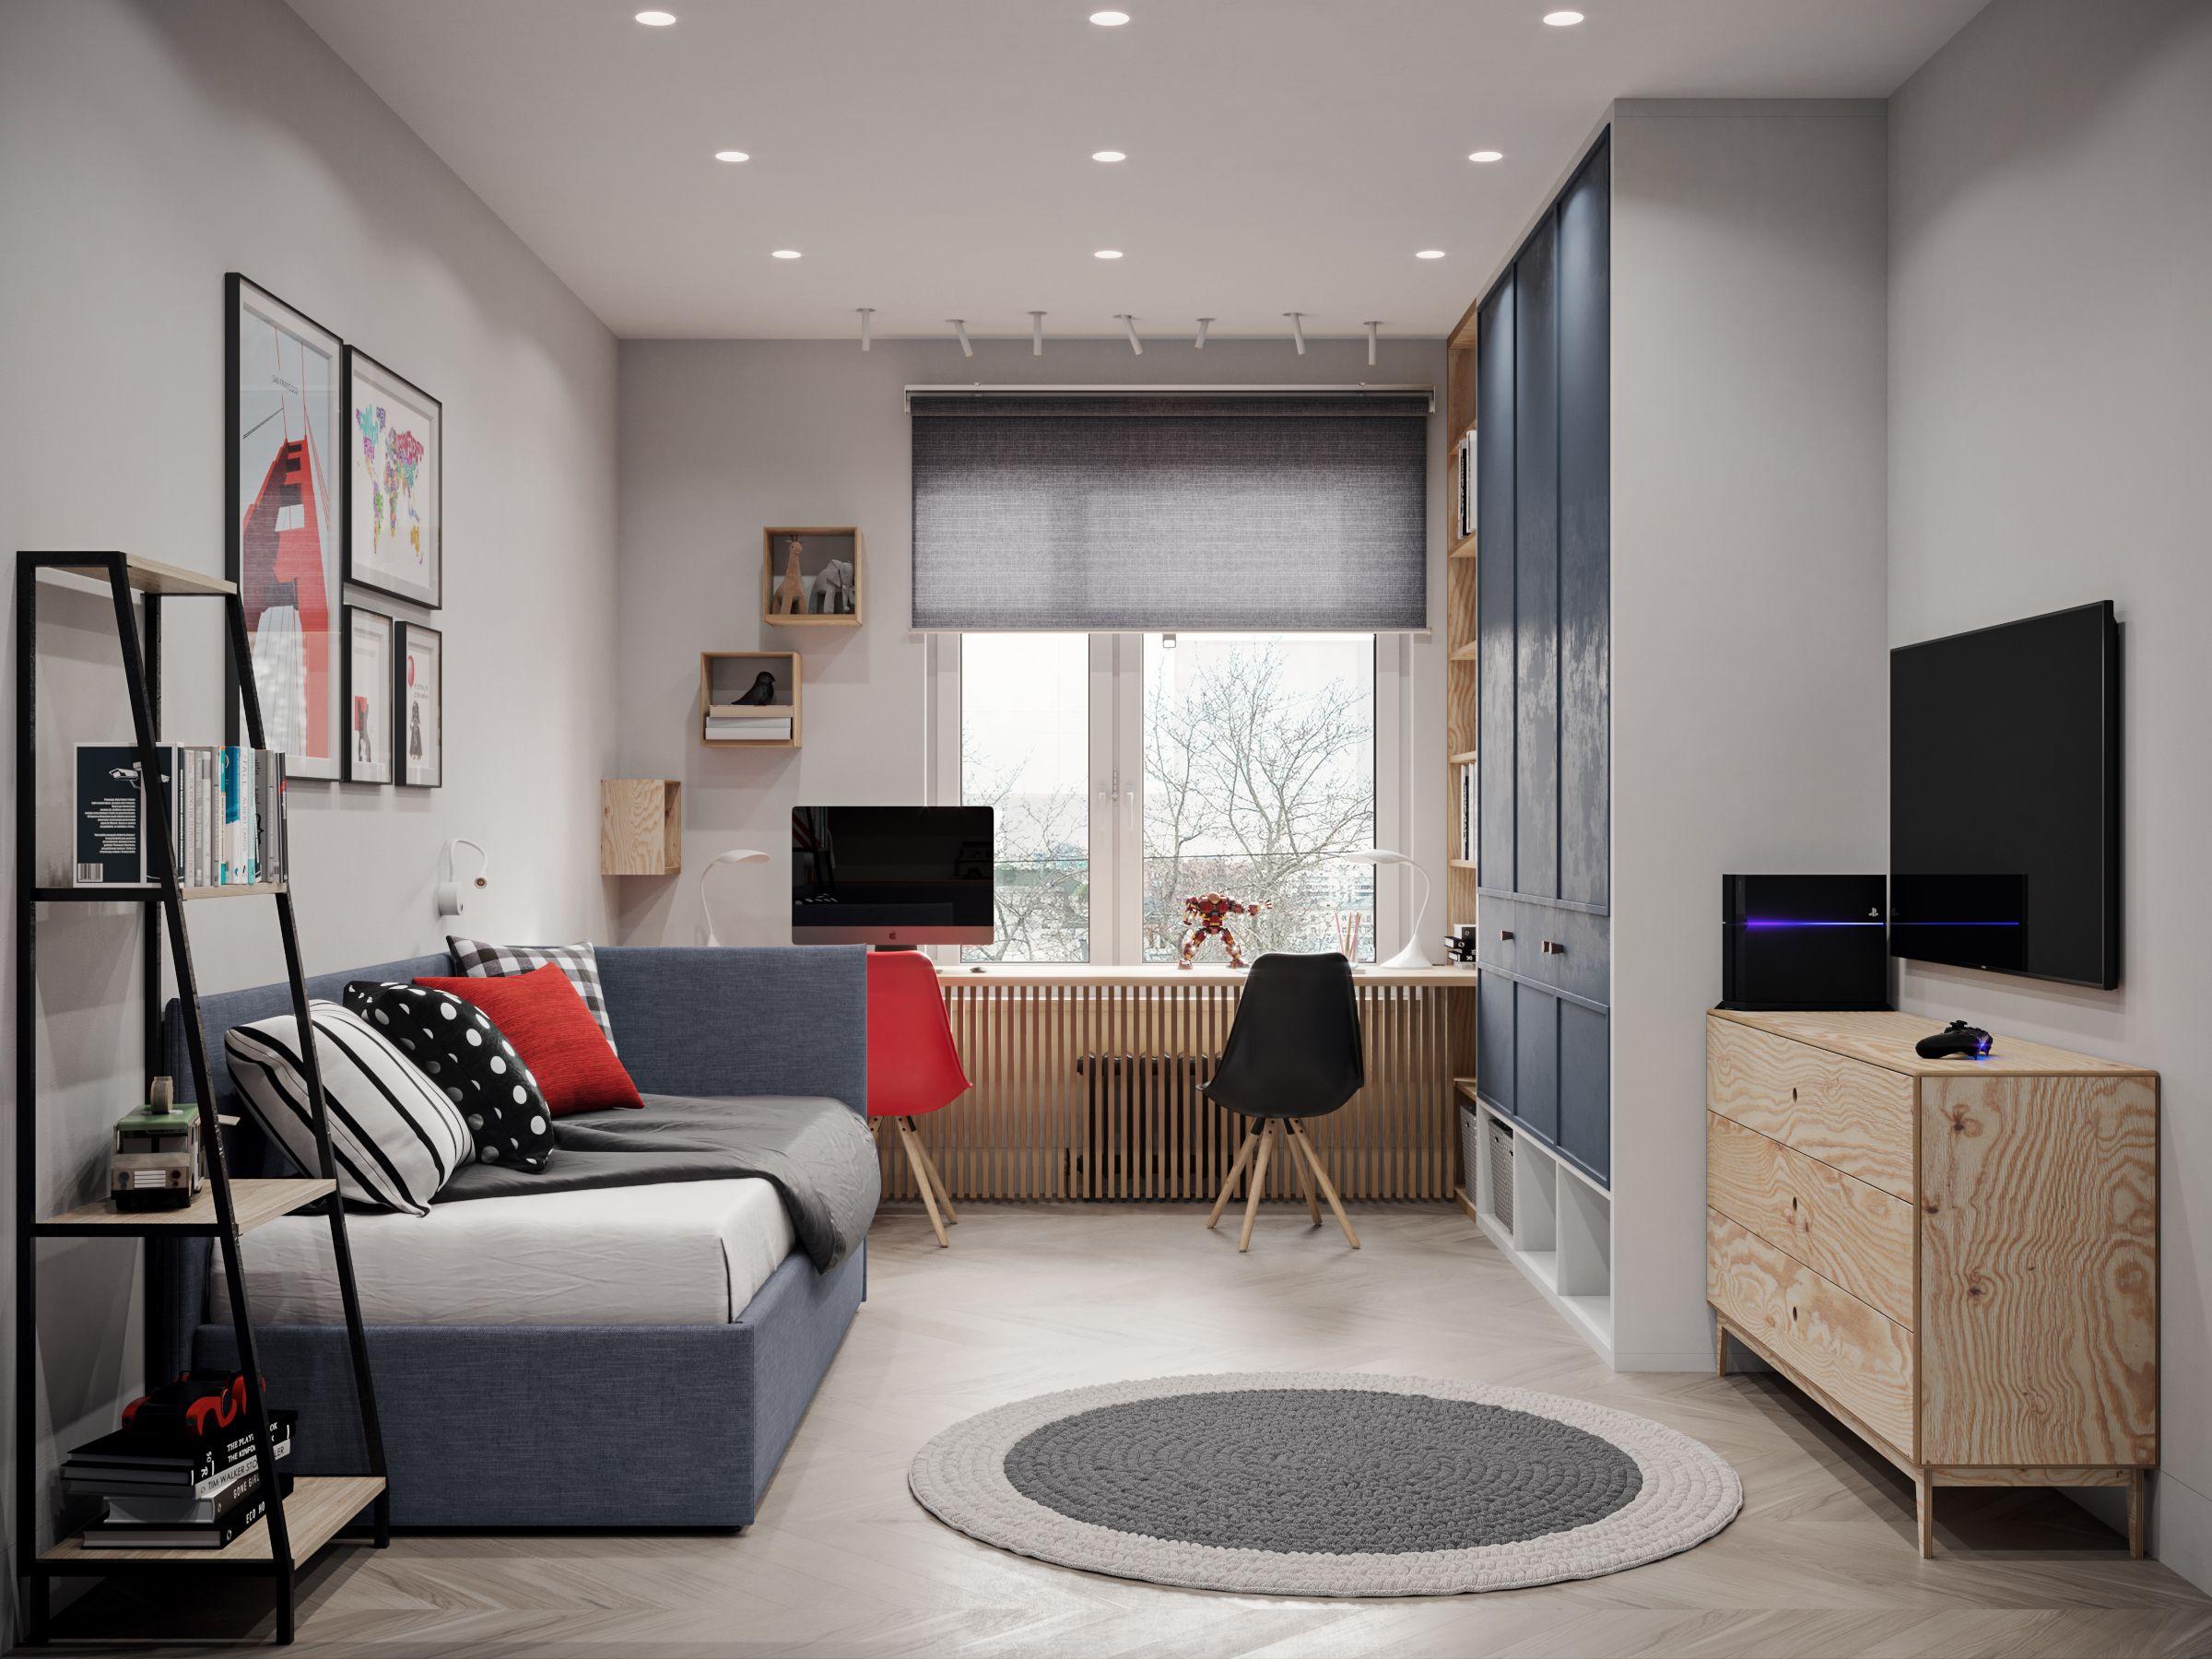 Marshal Zakharov On Behance With Images Boy Bedroom Design Home Office Design Interior Design Living Room